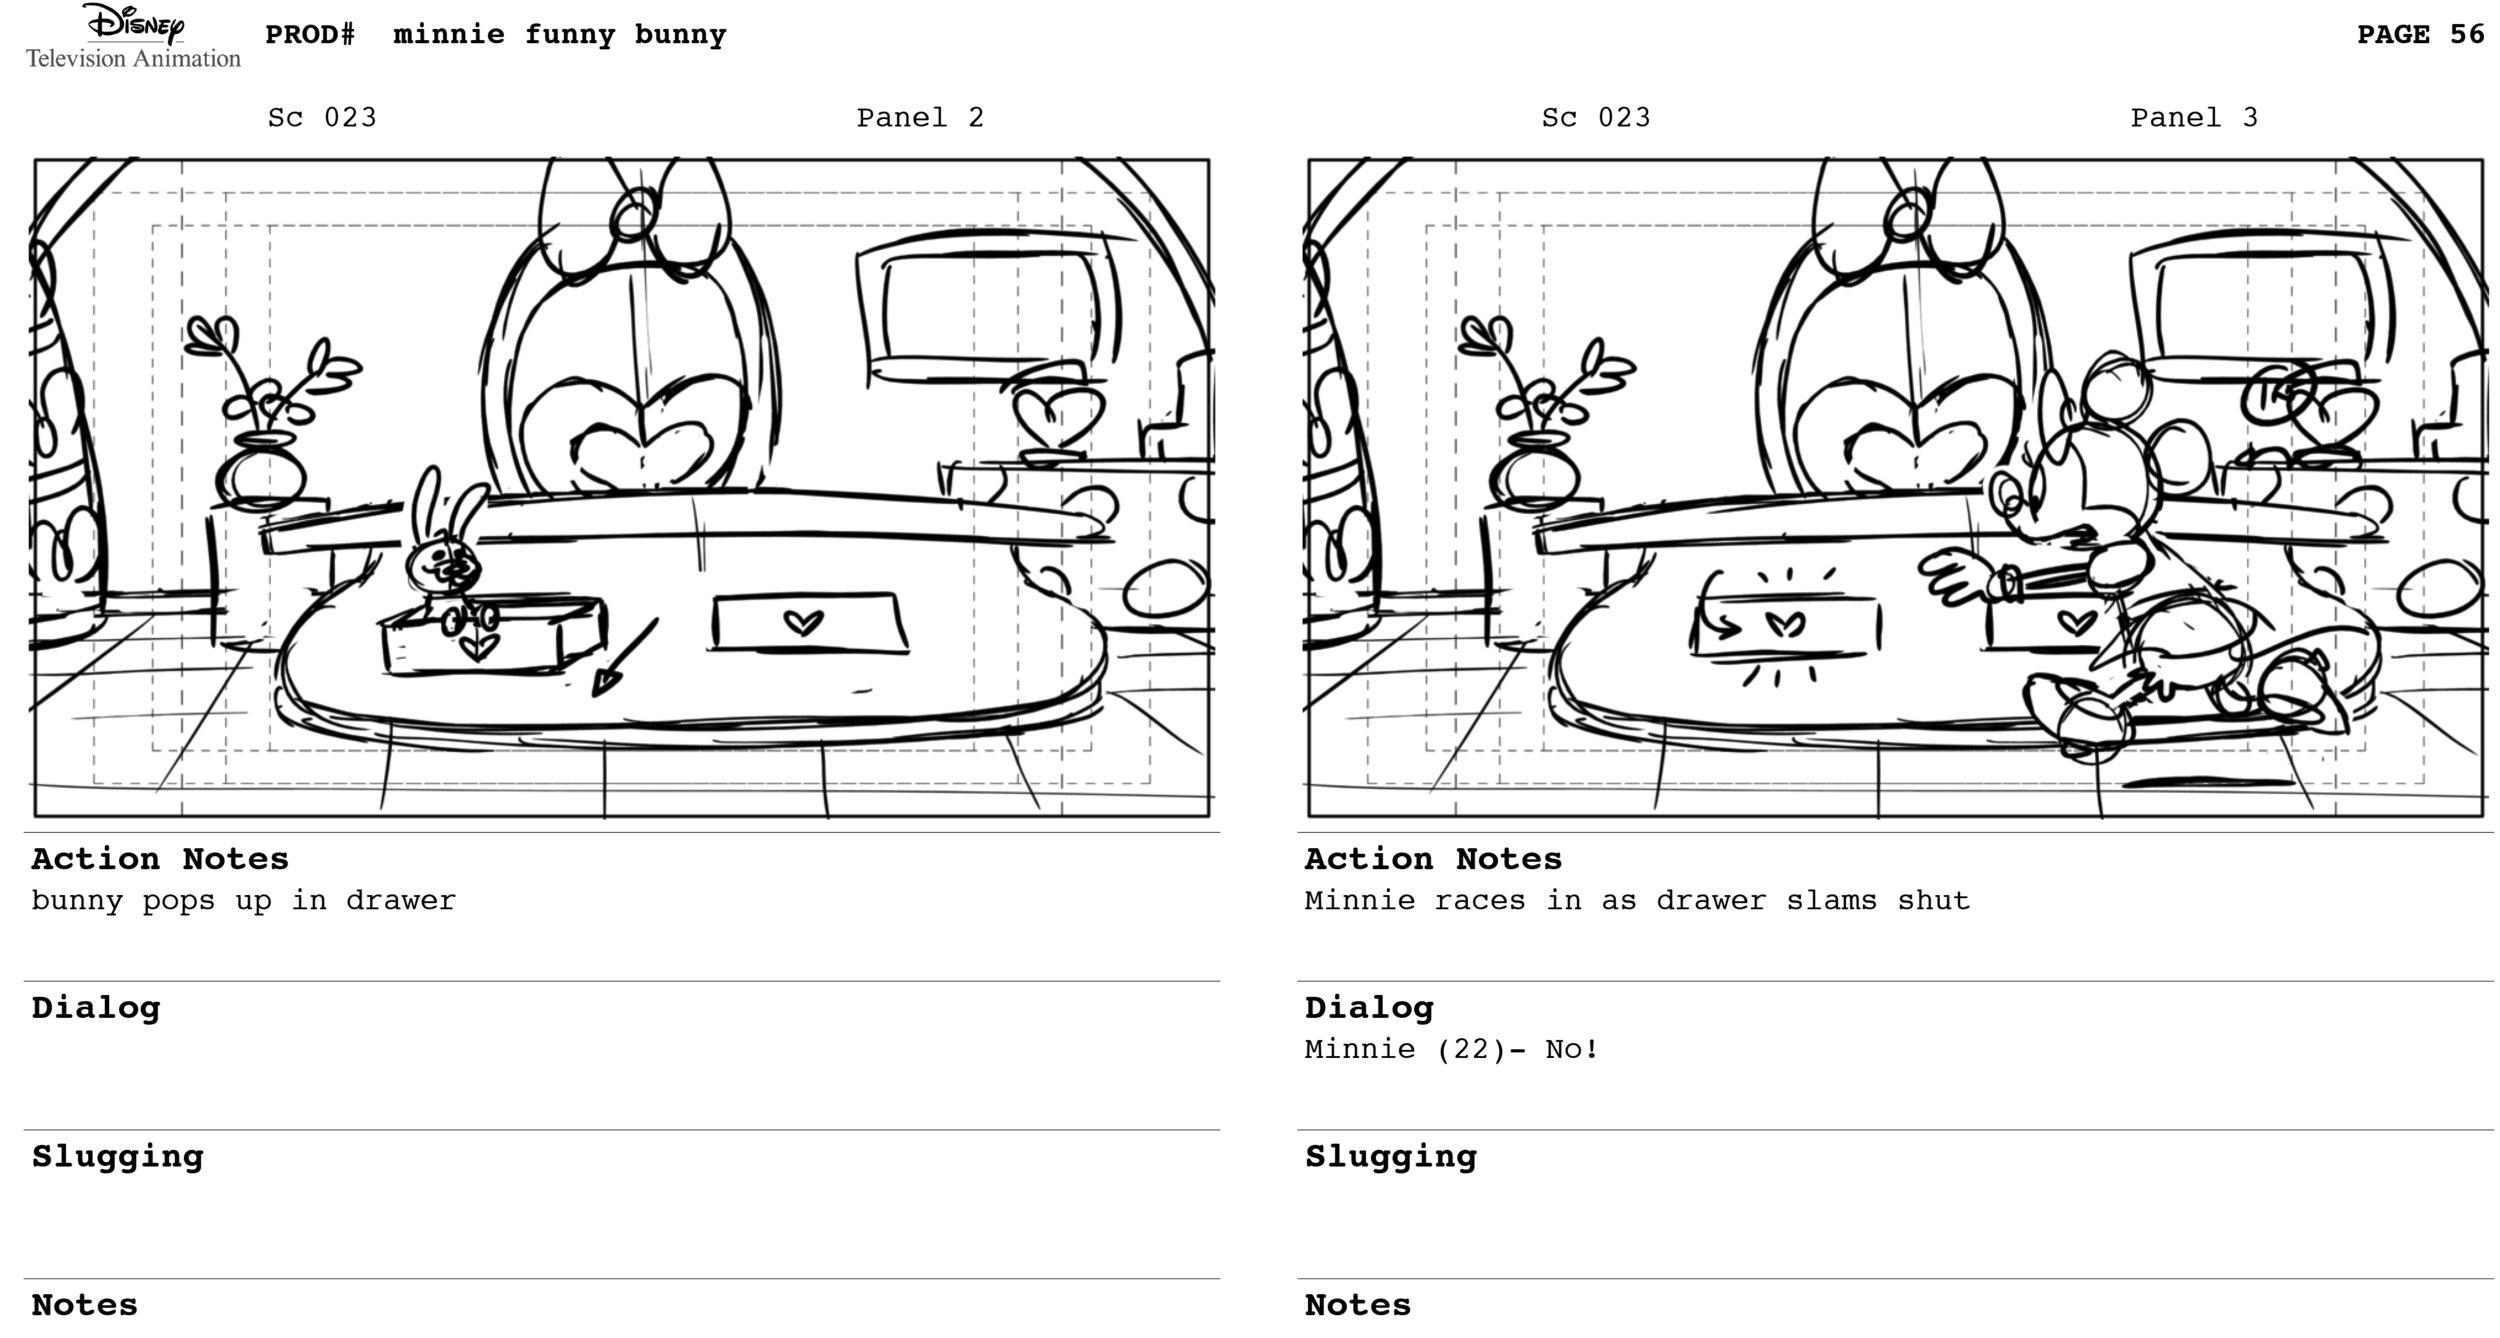 Funny_Bunny-57.jpg